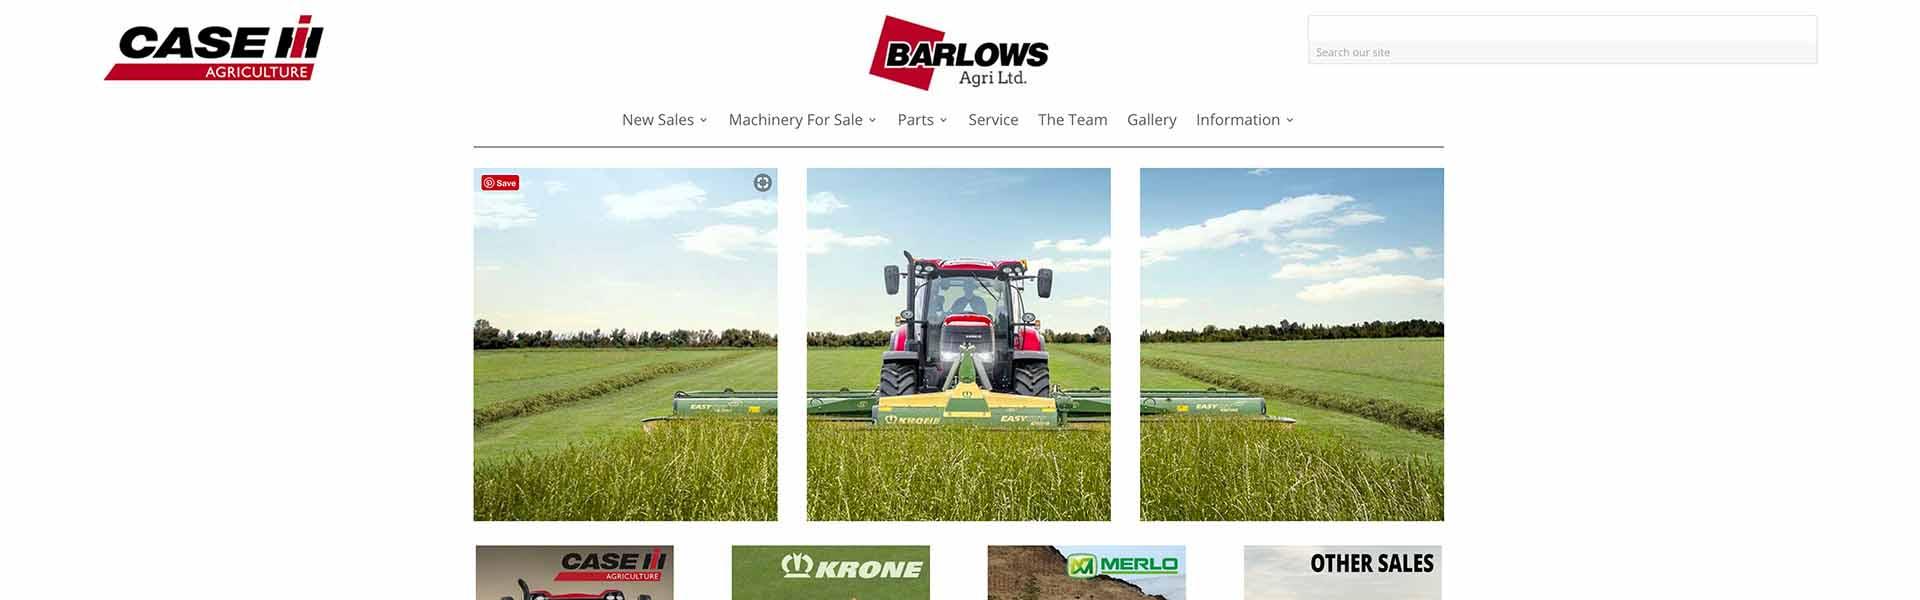 Web Design UK Portfolio Barlows Agri